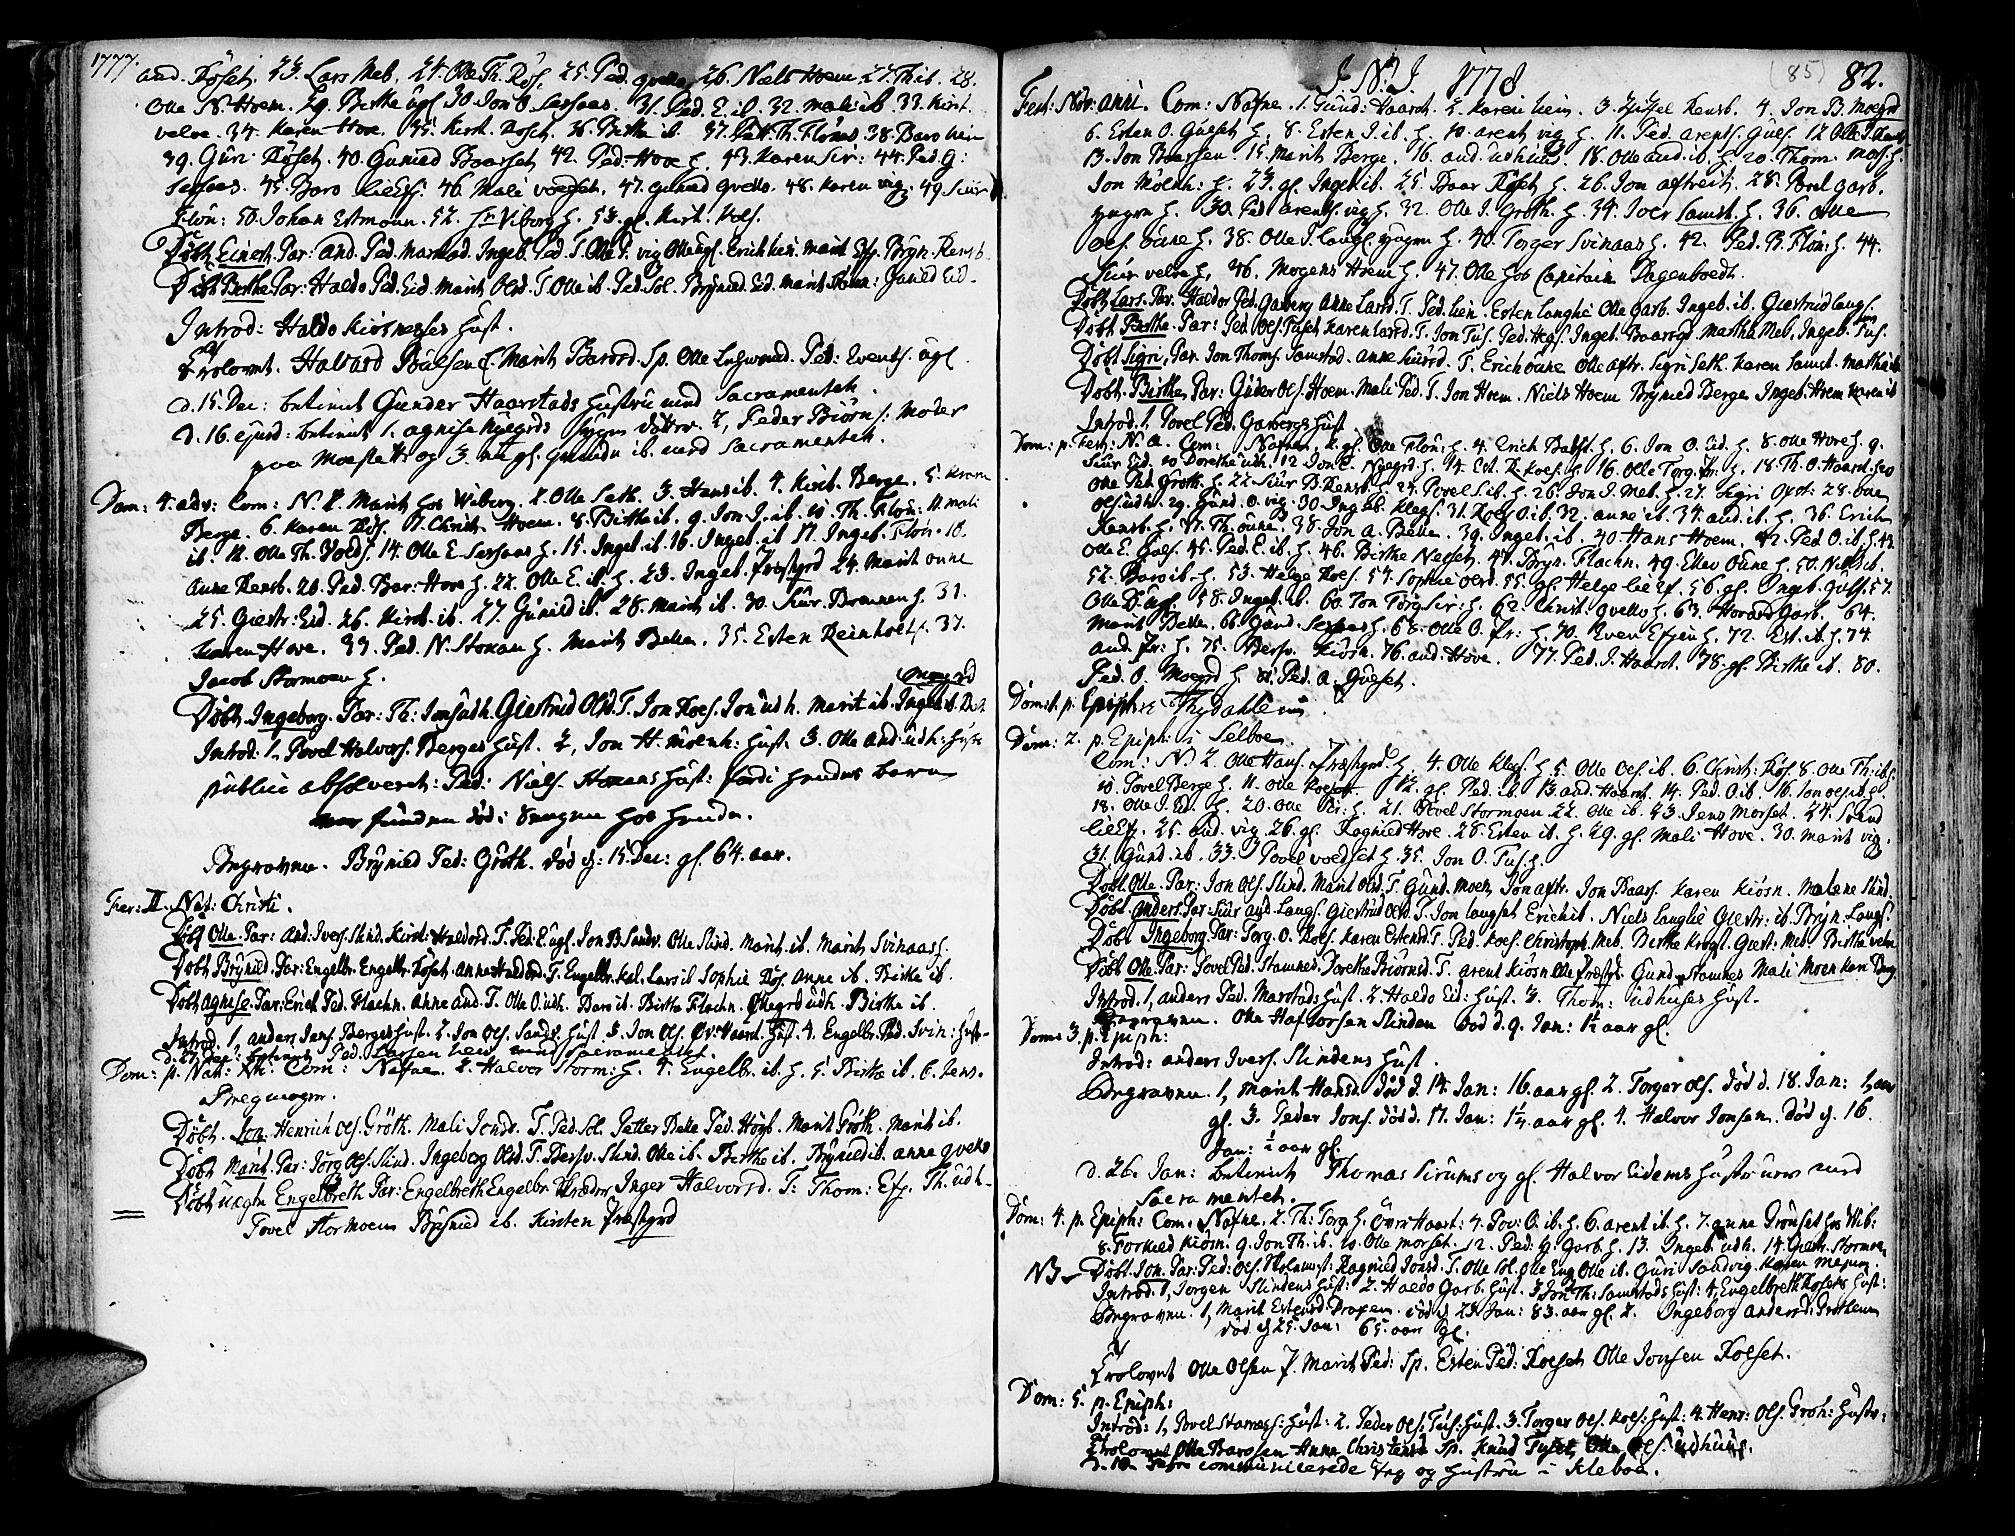 SAT, Ministerialprotokoller, klokkerbøker og fødselsregistre - Sør-Trøndelag, 695/L1138: Parish register (official) no. 695A02 /1, 1757-1801, p. 85